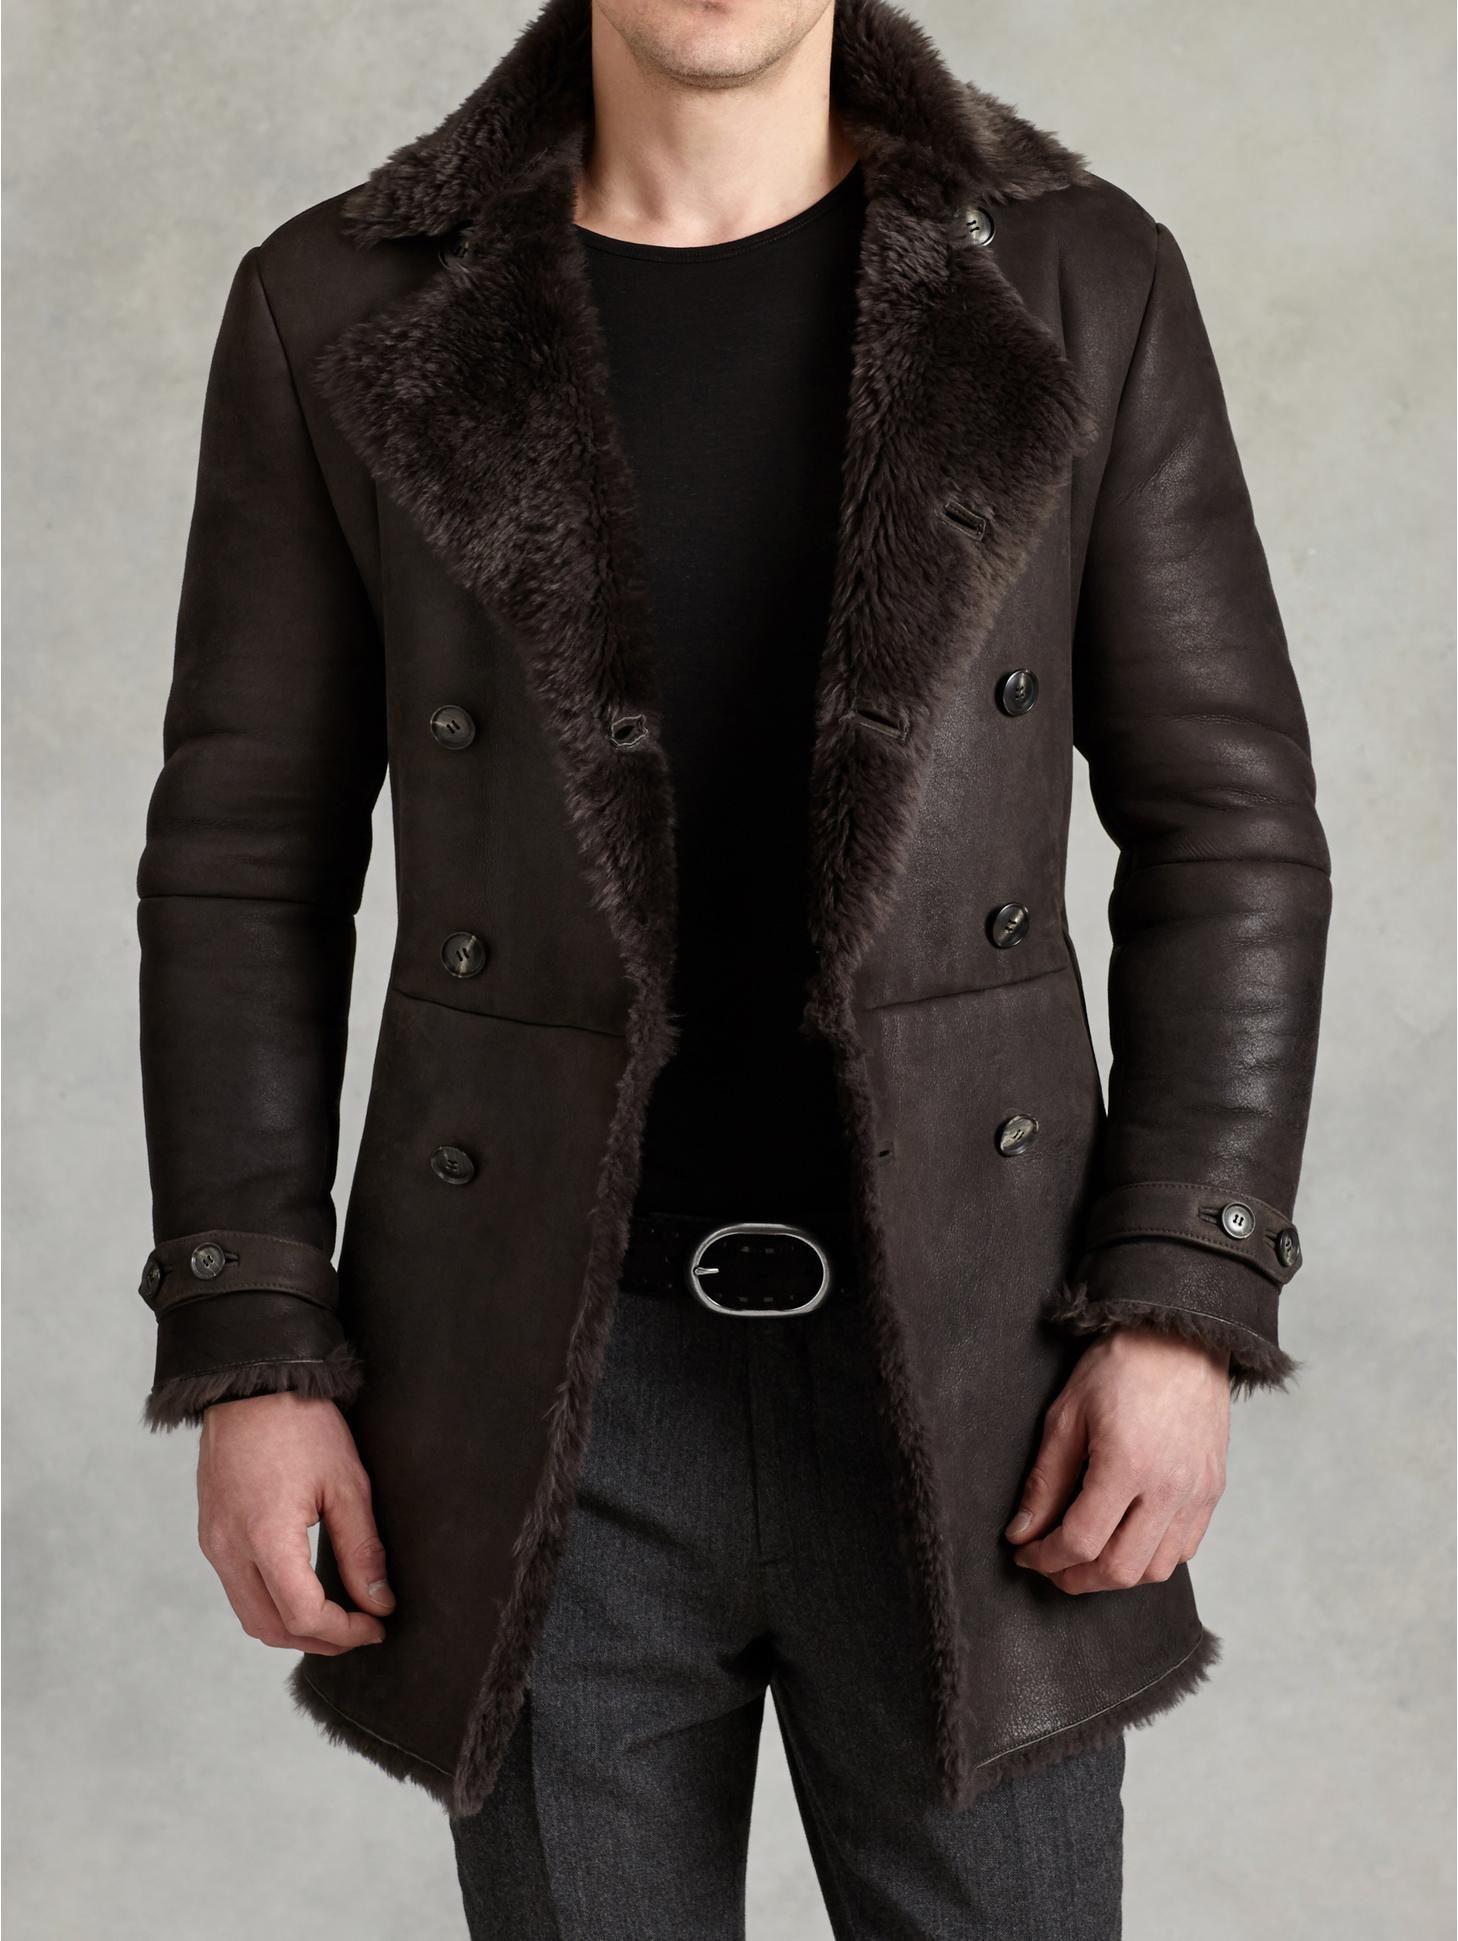 double breasted shearling coat john varvatos mens jackets #2: 22e830c2996cb e70b6e27e271c